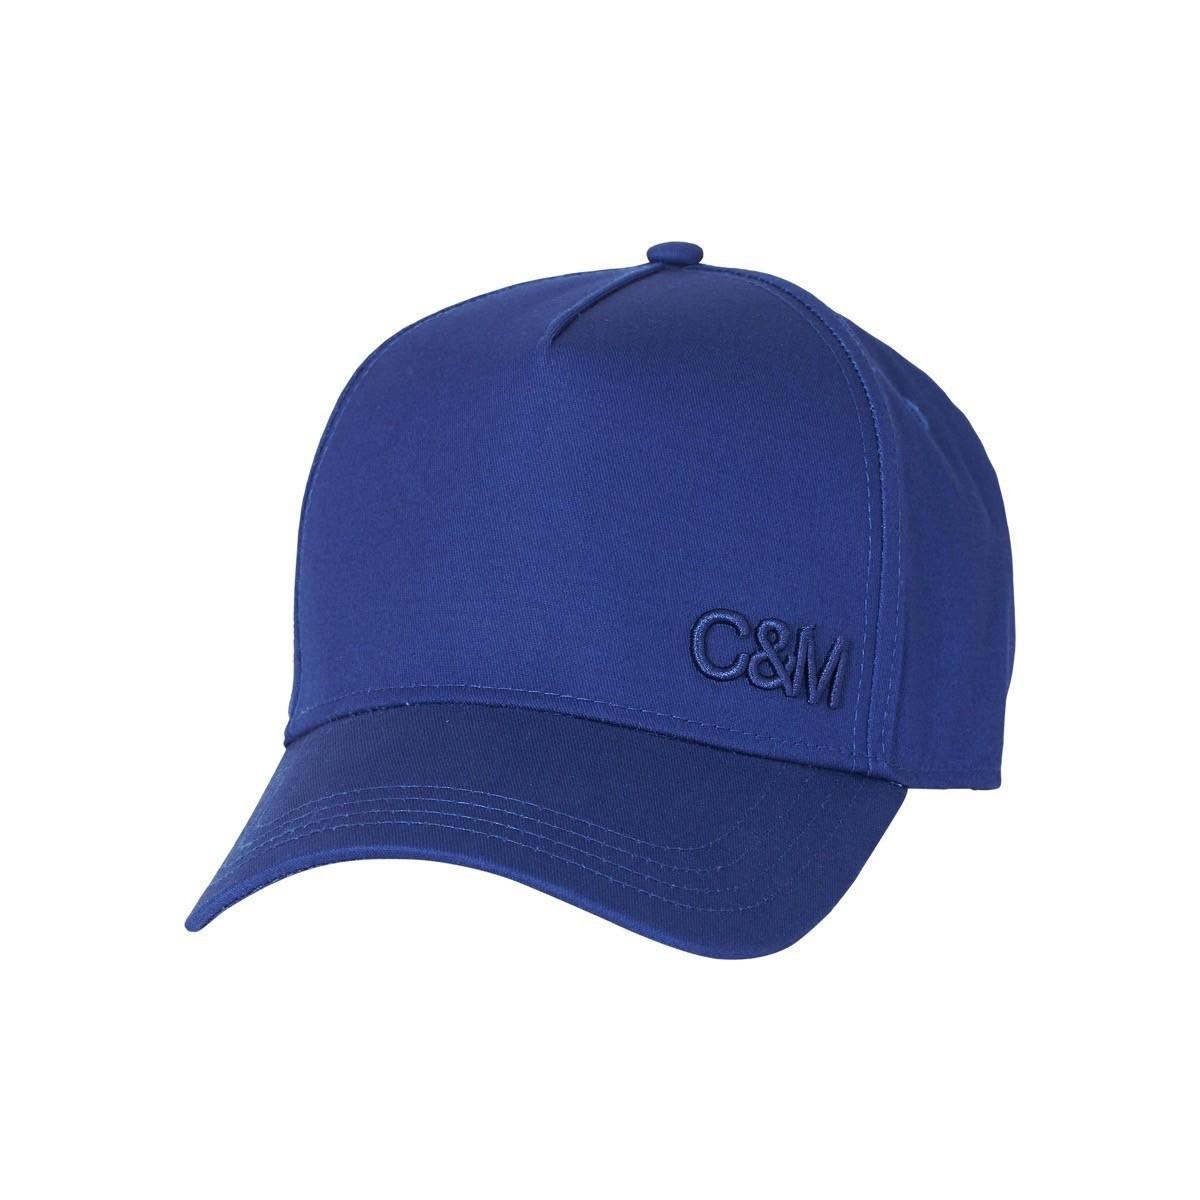 S96-WAYSIDE CAP OCMA 98 COBALT-17135-C&M-292